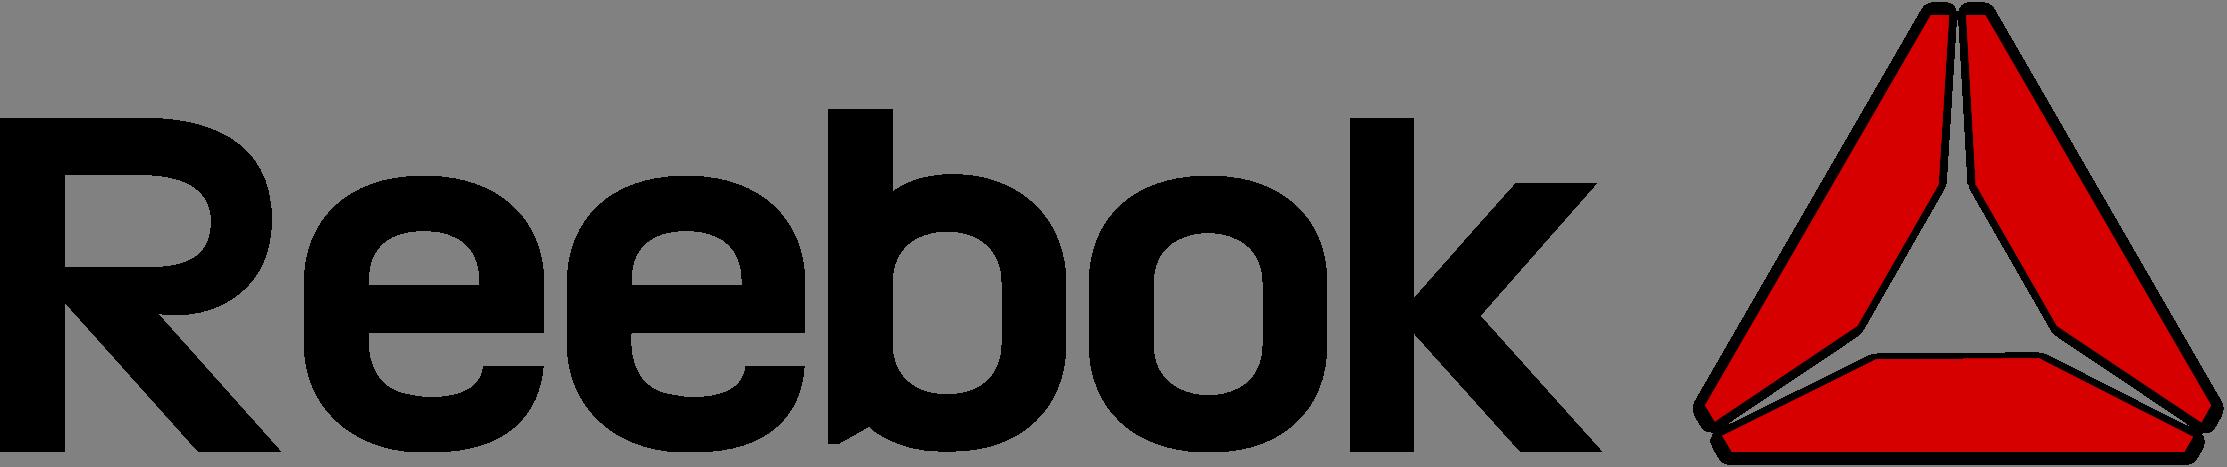 2014 Reebok